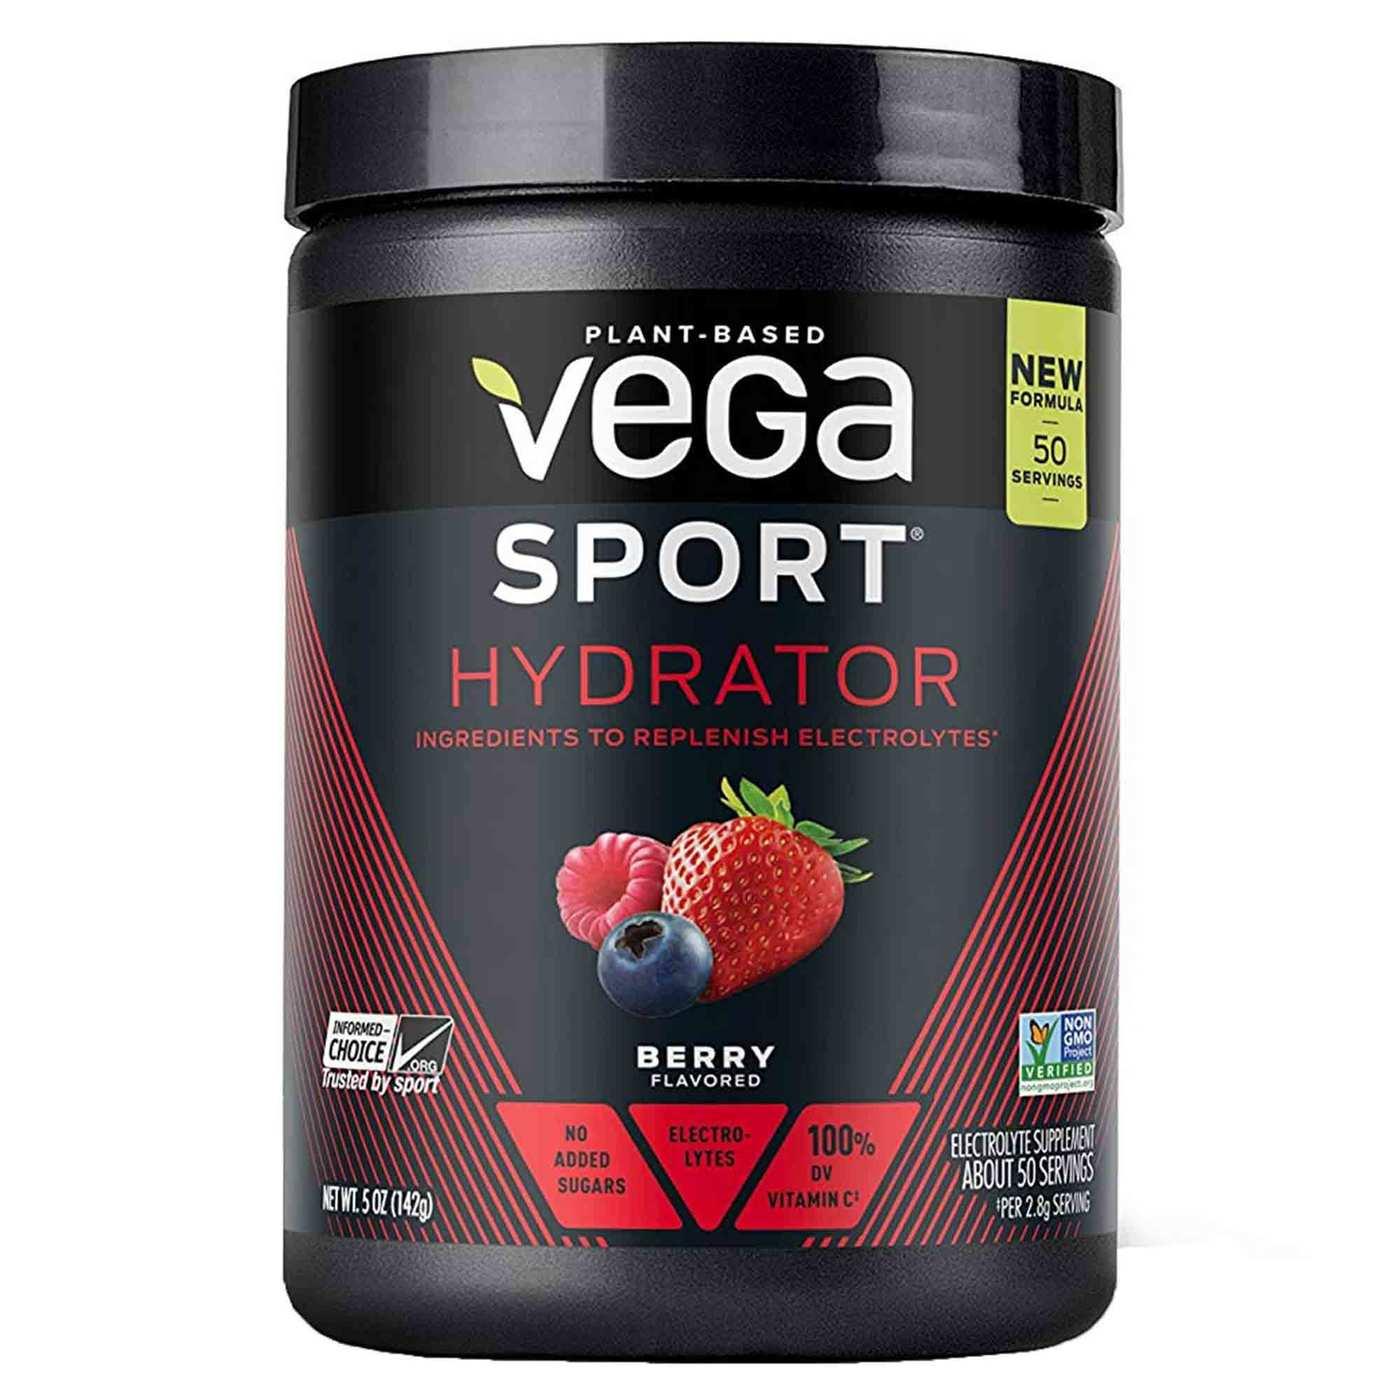 Image result for vega sport